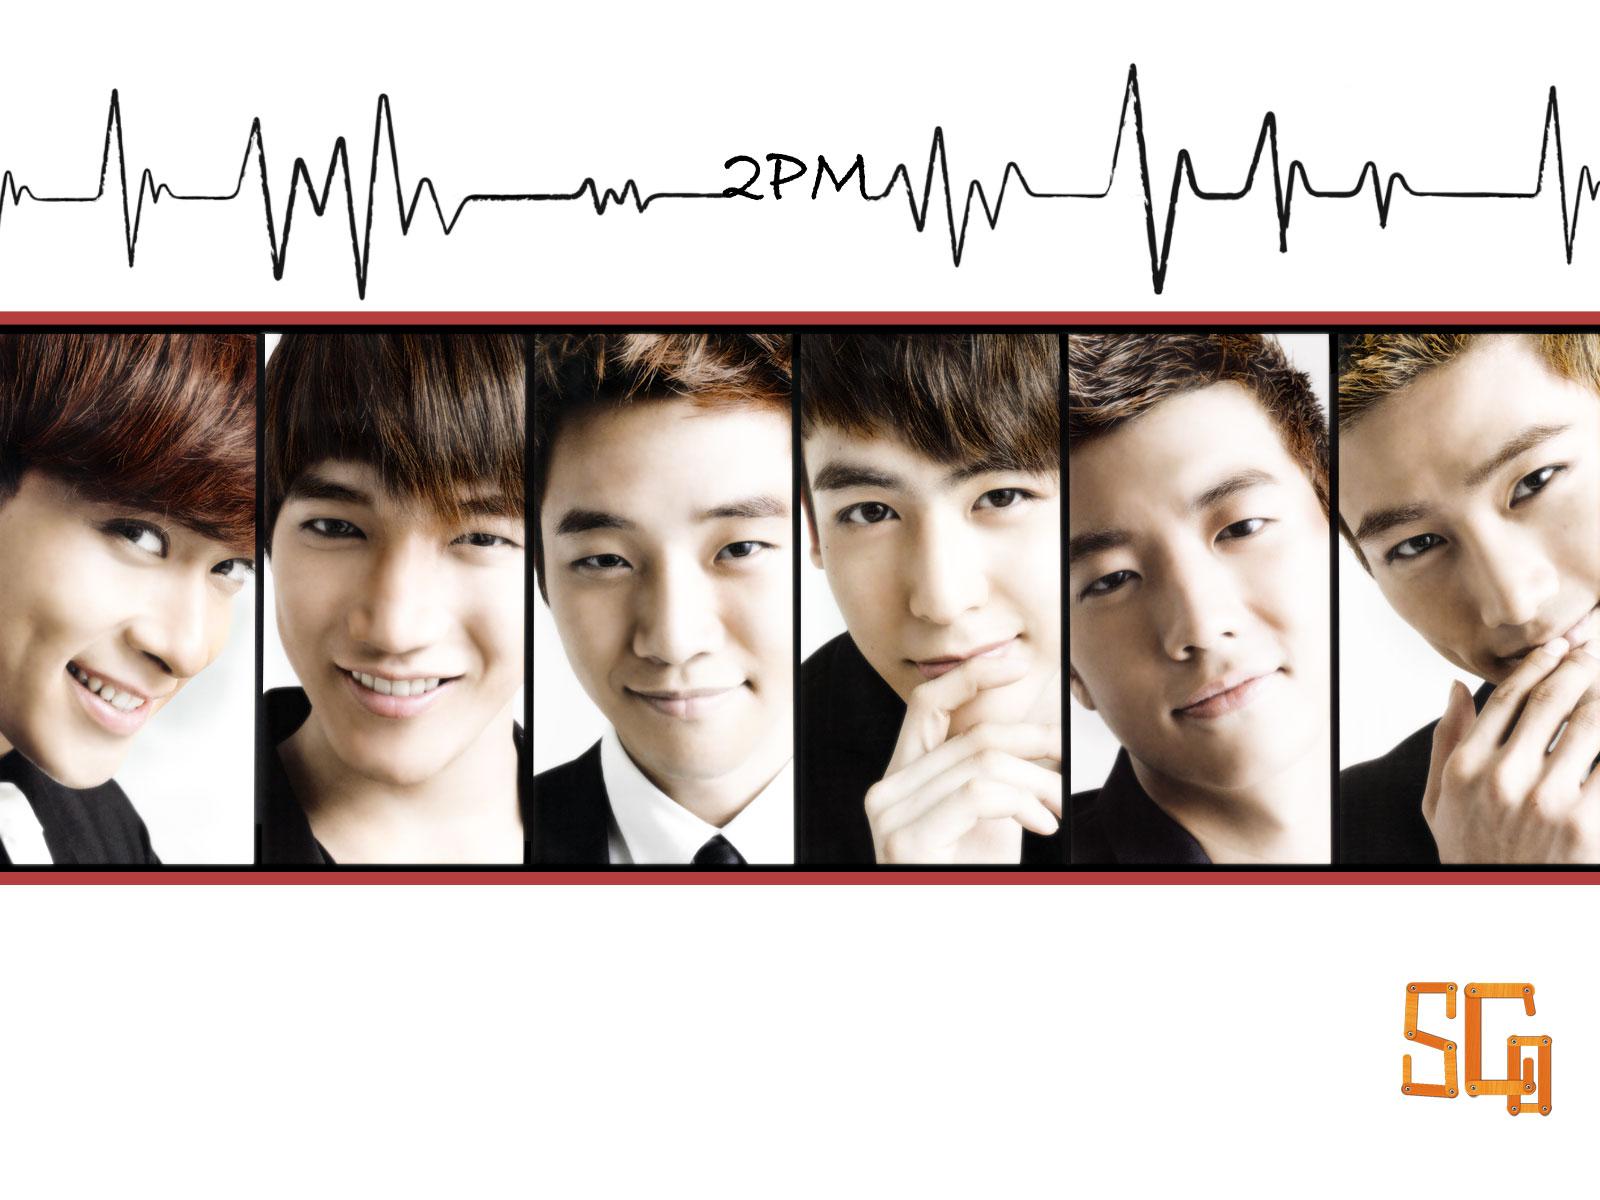 2PM  2pm Wallpaper 30186277  Fanpop